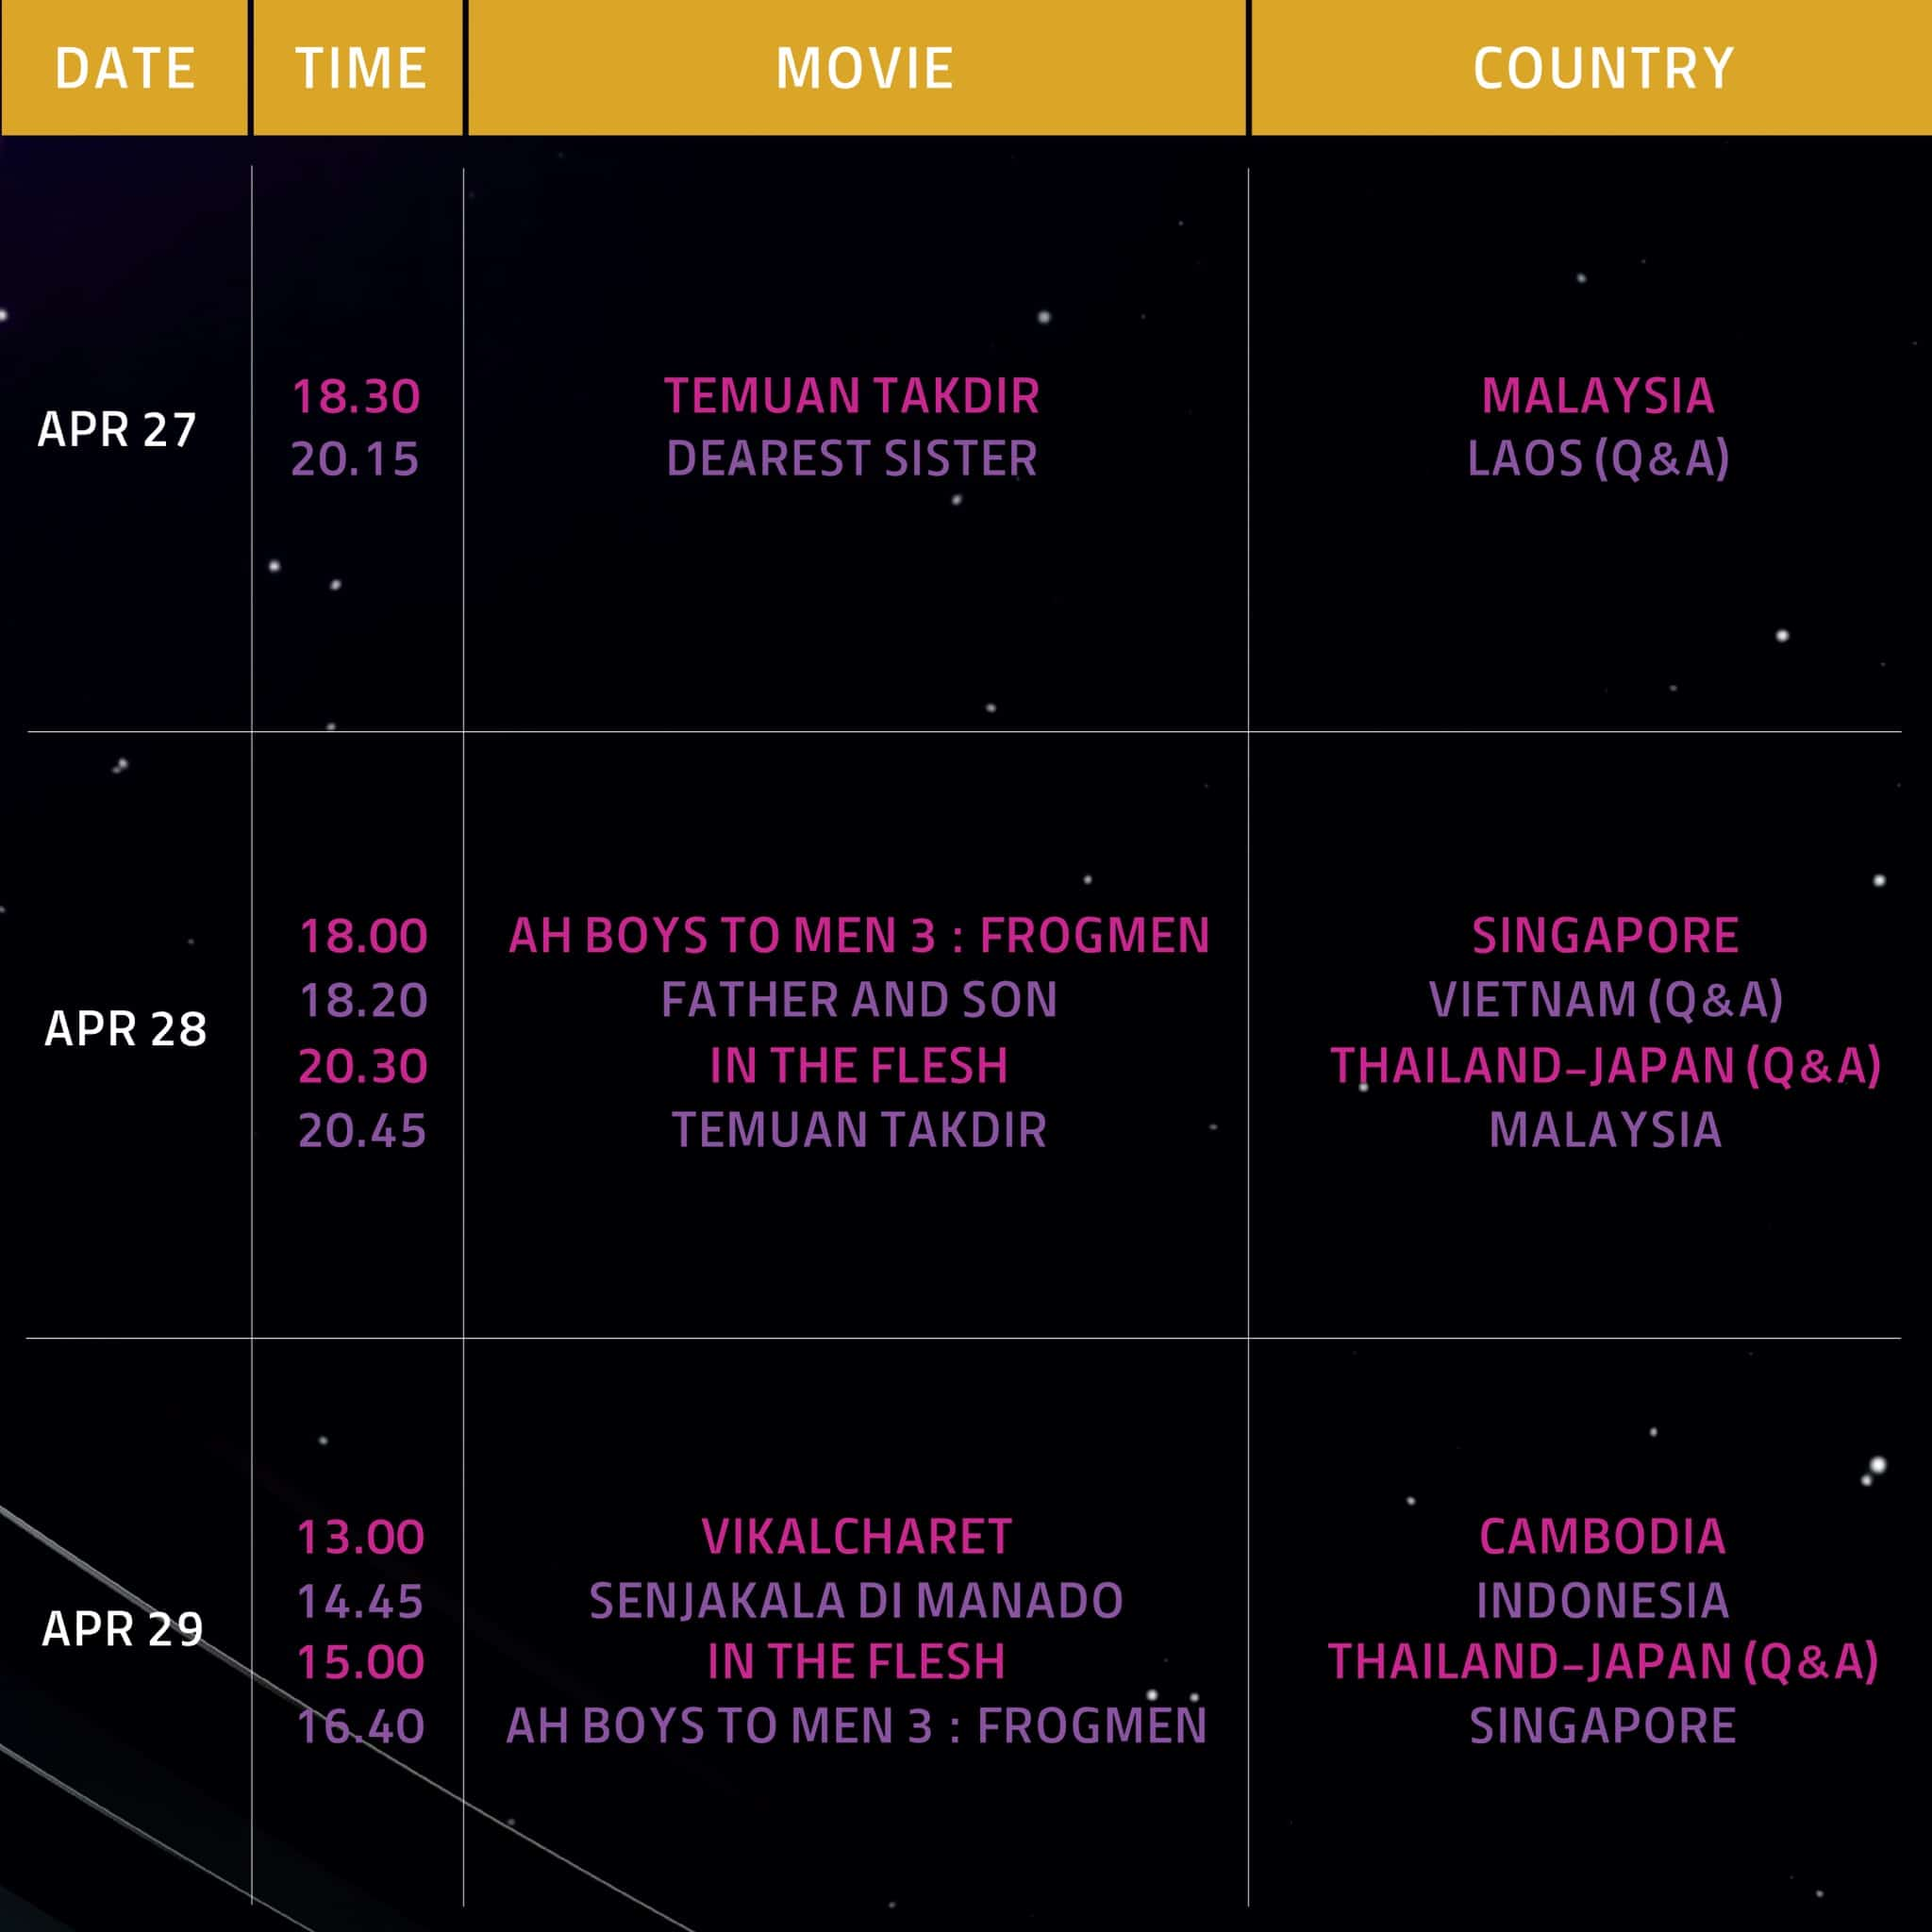 bangkok-ASEAN-film-festival-13